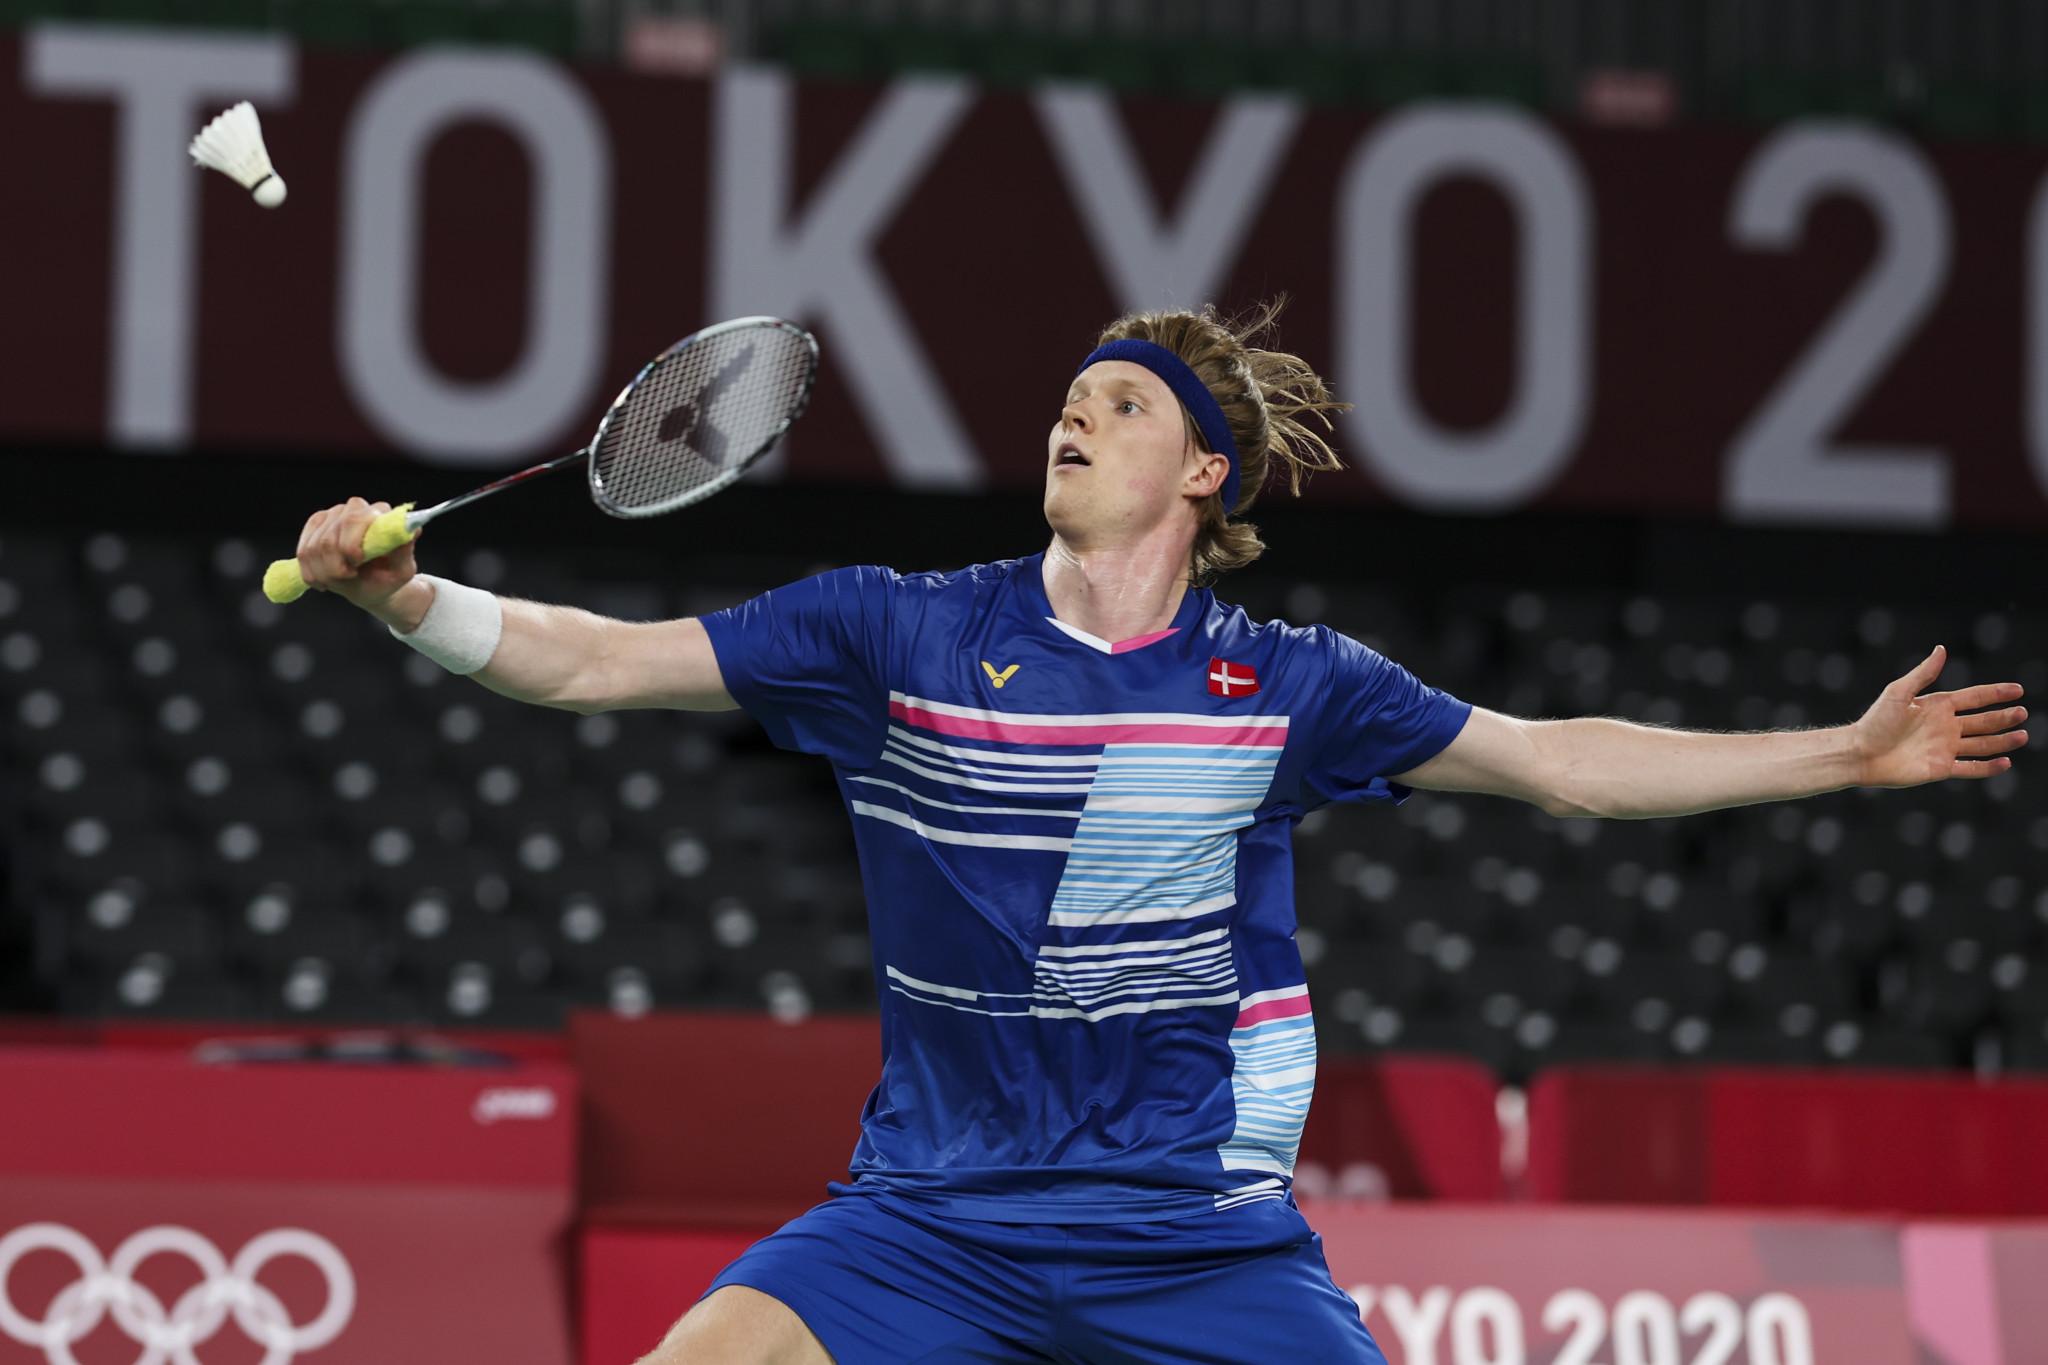 Top seed Momota progresses at BWF Denmark Open as Antonsen wins repeat of last year's final